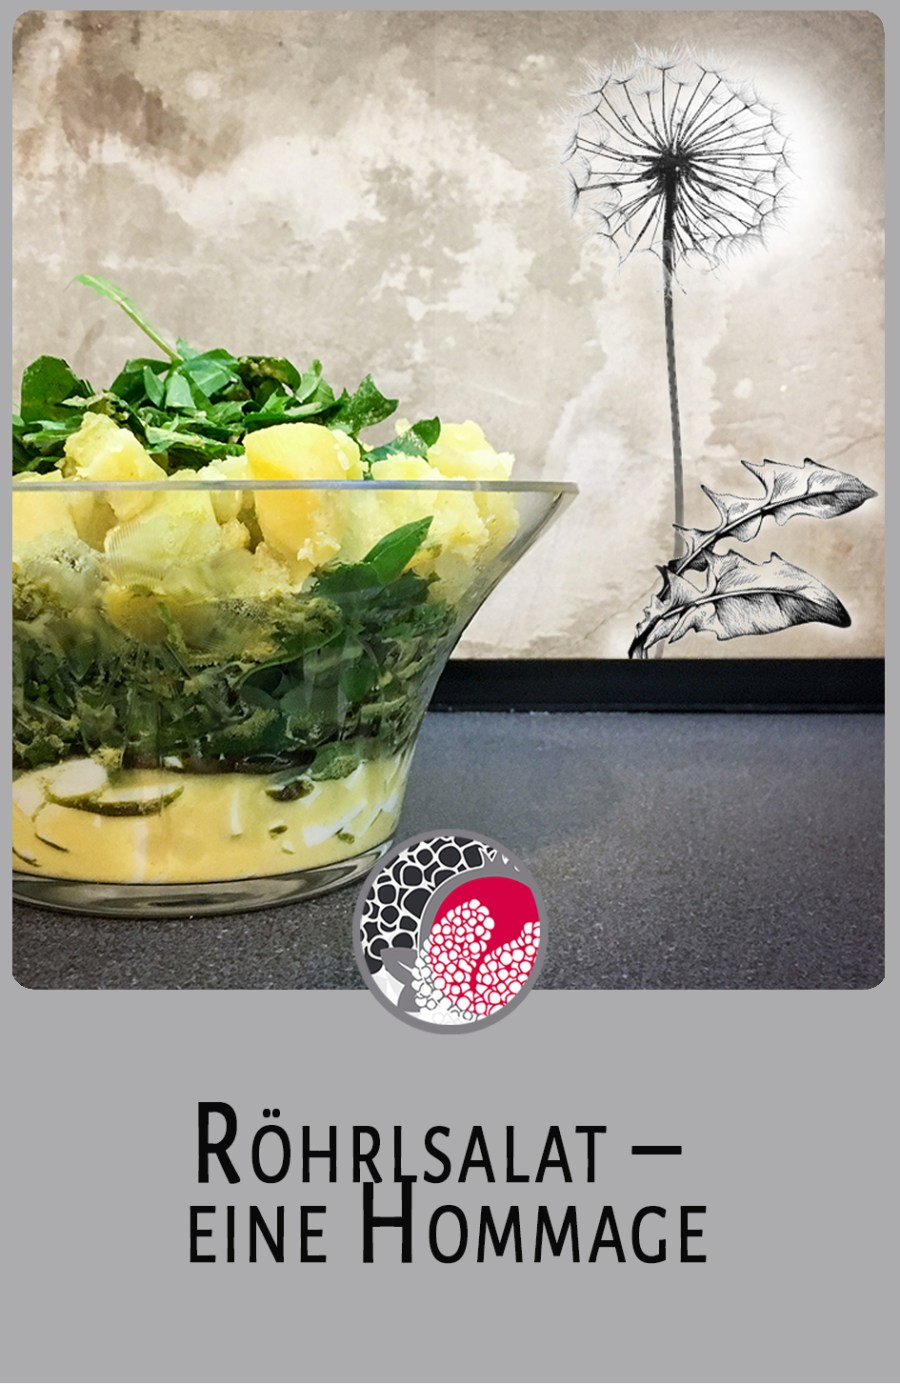 Röhrlsalat, Löwenzahn Salat, Löwenzahnsalt, dandelion, salad